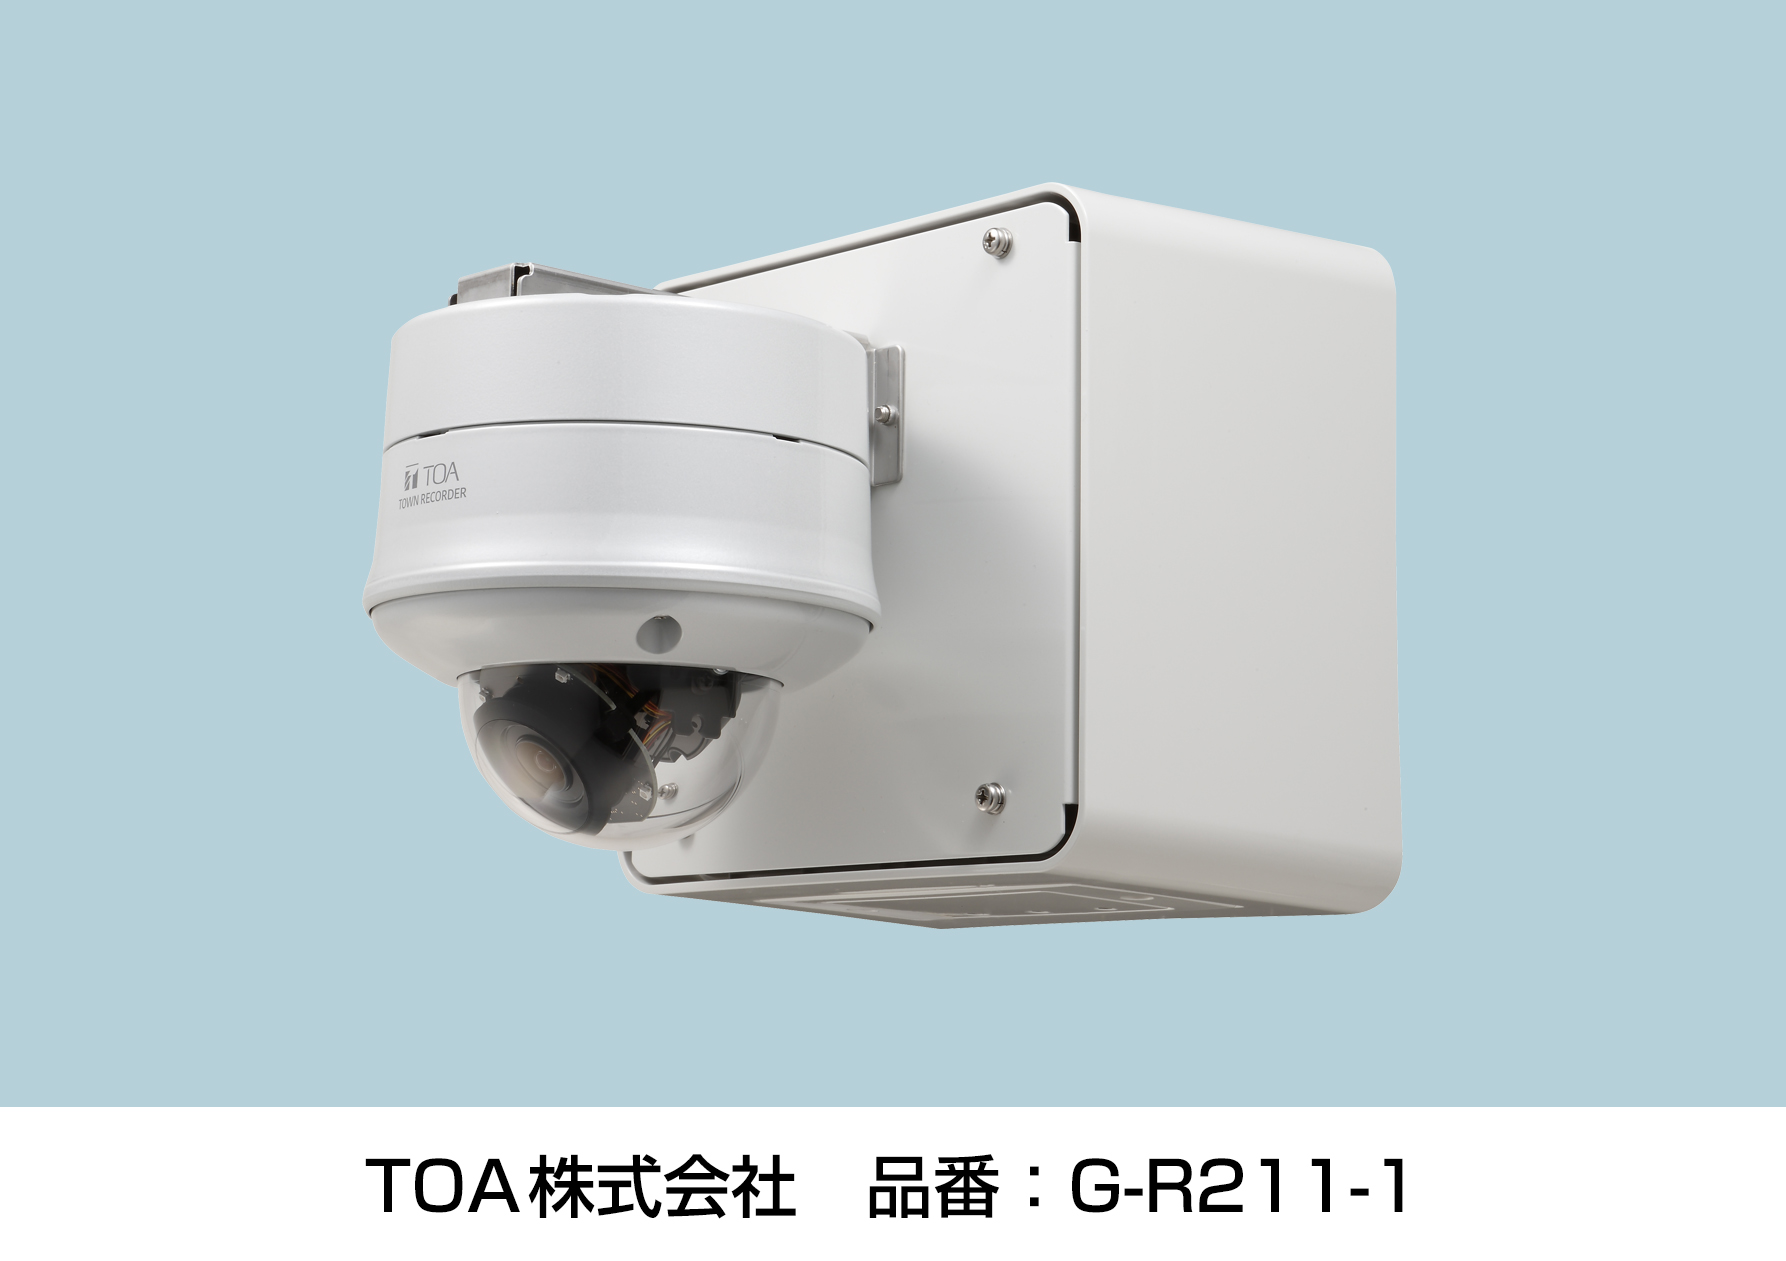 【TOA】街の防犯・安全管理を、遠隔通知機能で安定運用  屋外ドームカメラ一体型レコーダー『タウンレコーダー』シリーズ、新機種を発売の画像